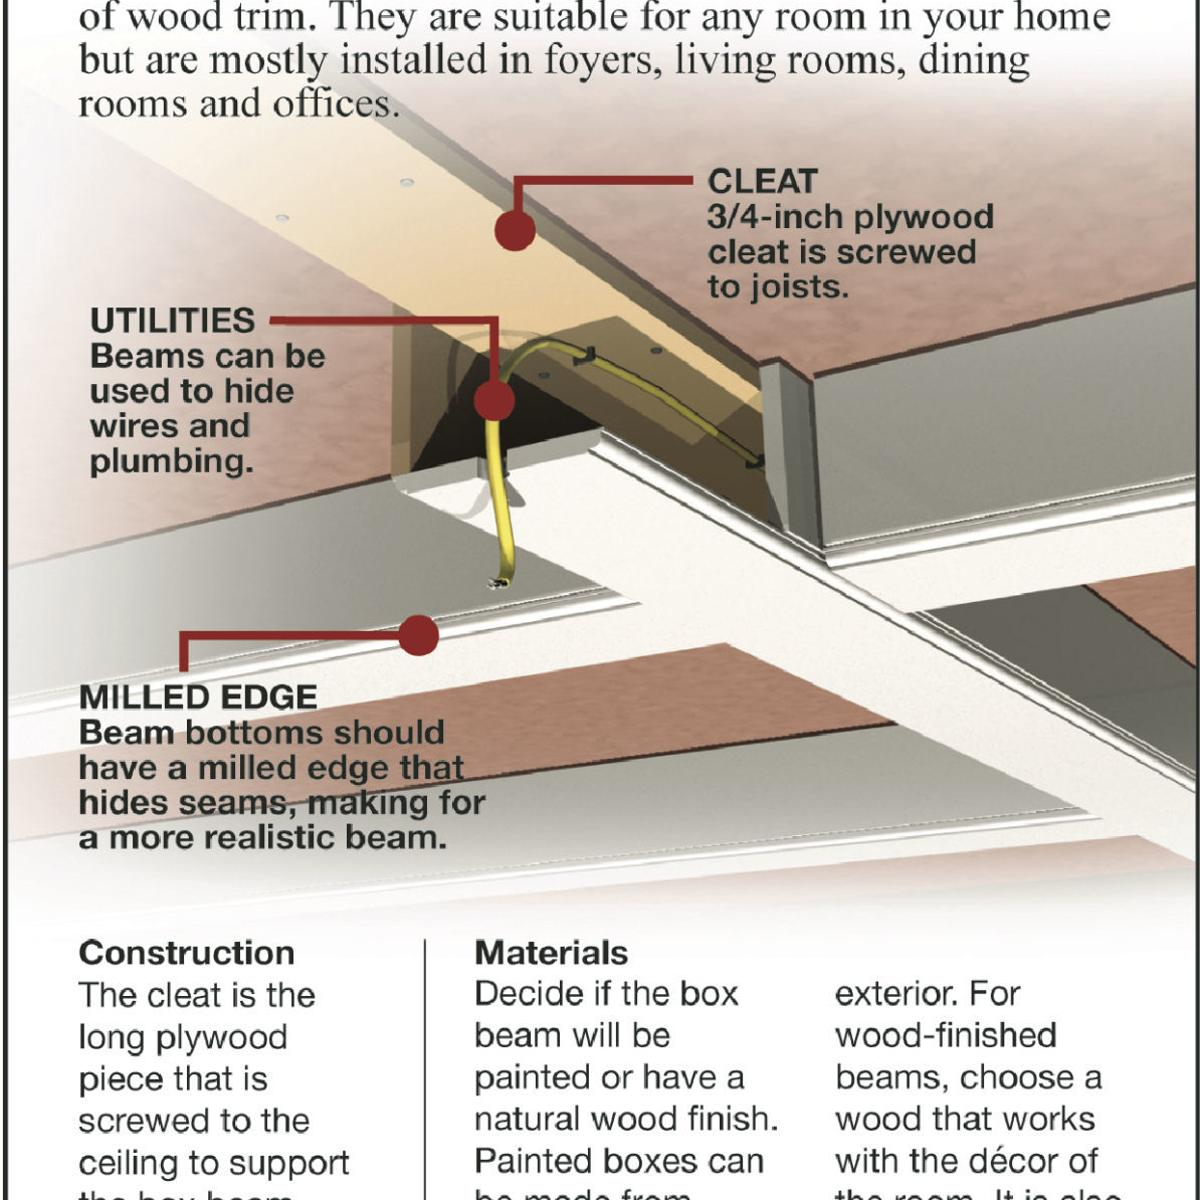 Install A Lightweight Box Beam On Ceiling Siouxland Homes Siouxcityjournal Com